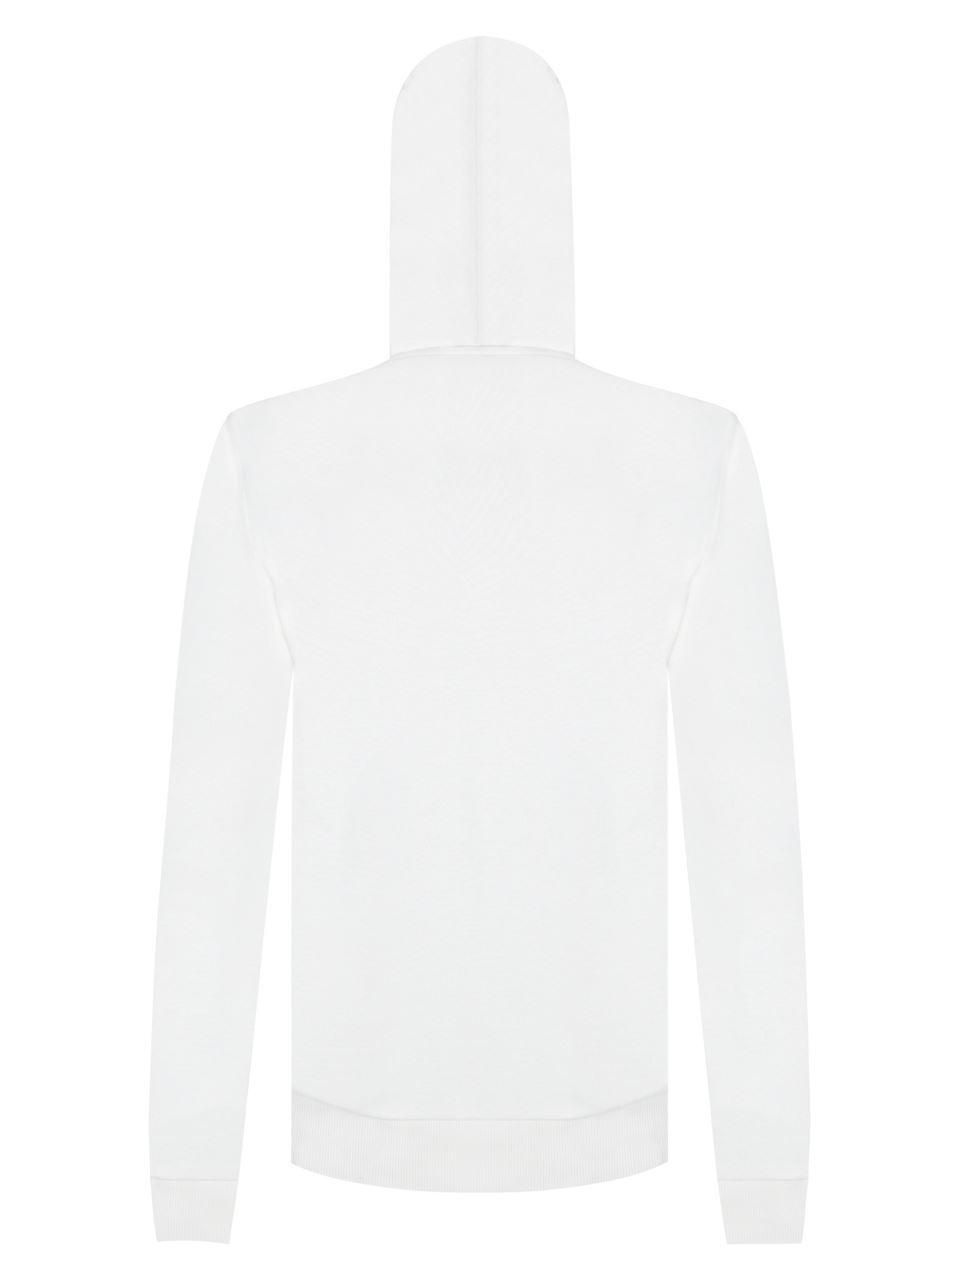 K85768 Sweatshirt_Try